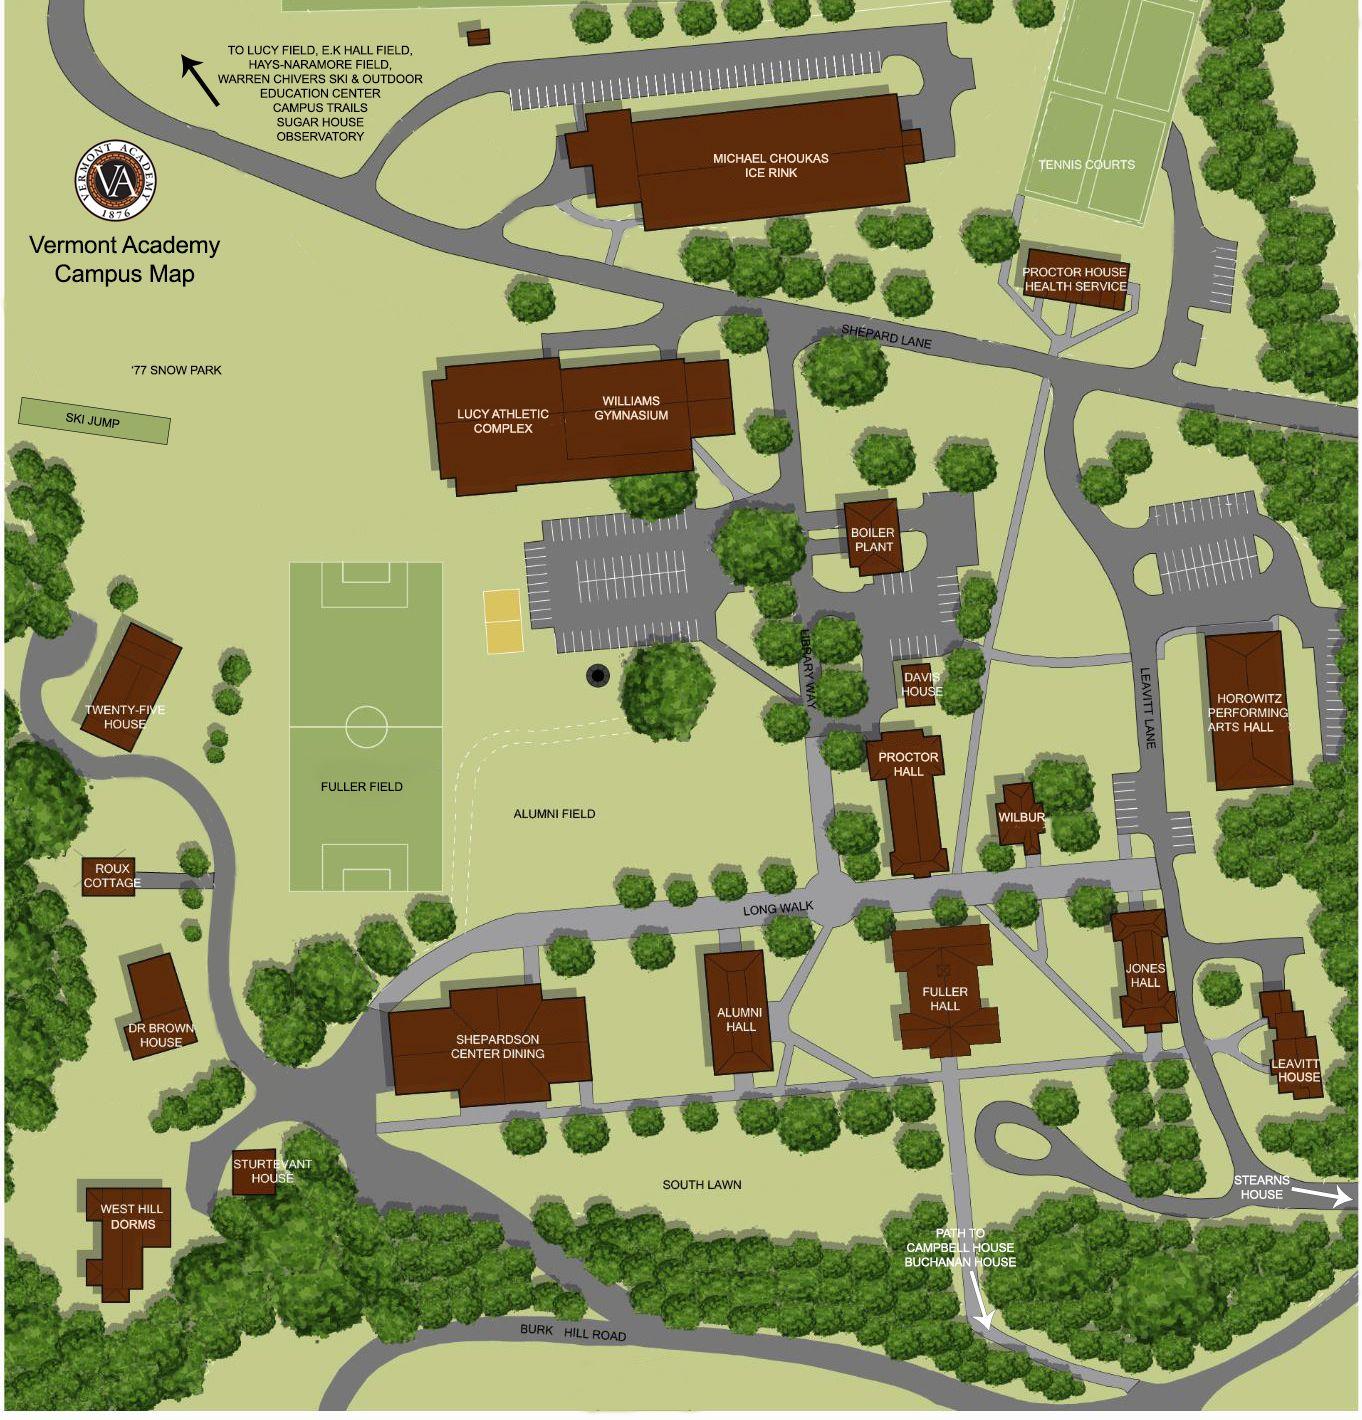 Vermont Academy Campus Map